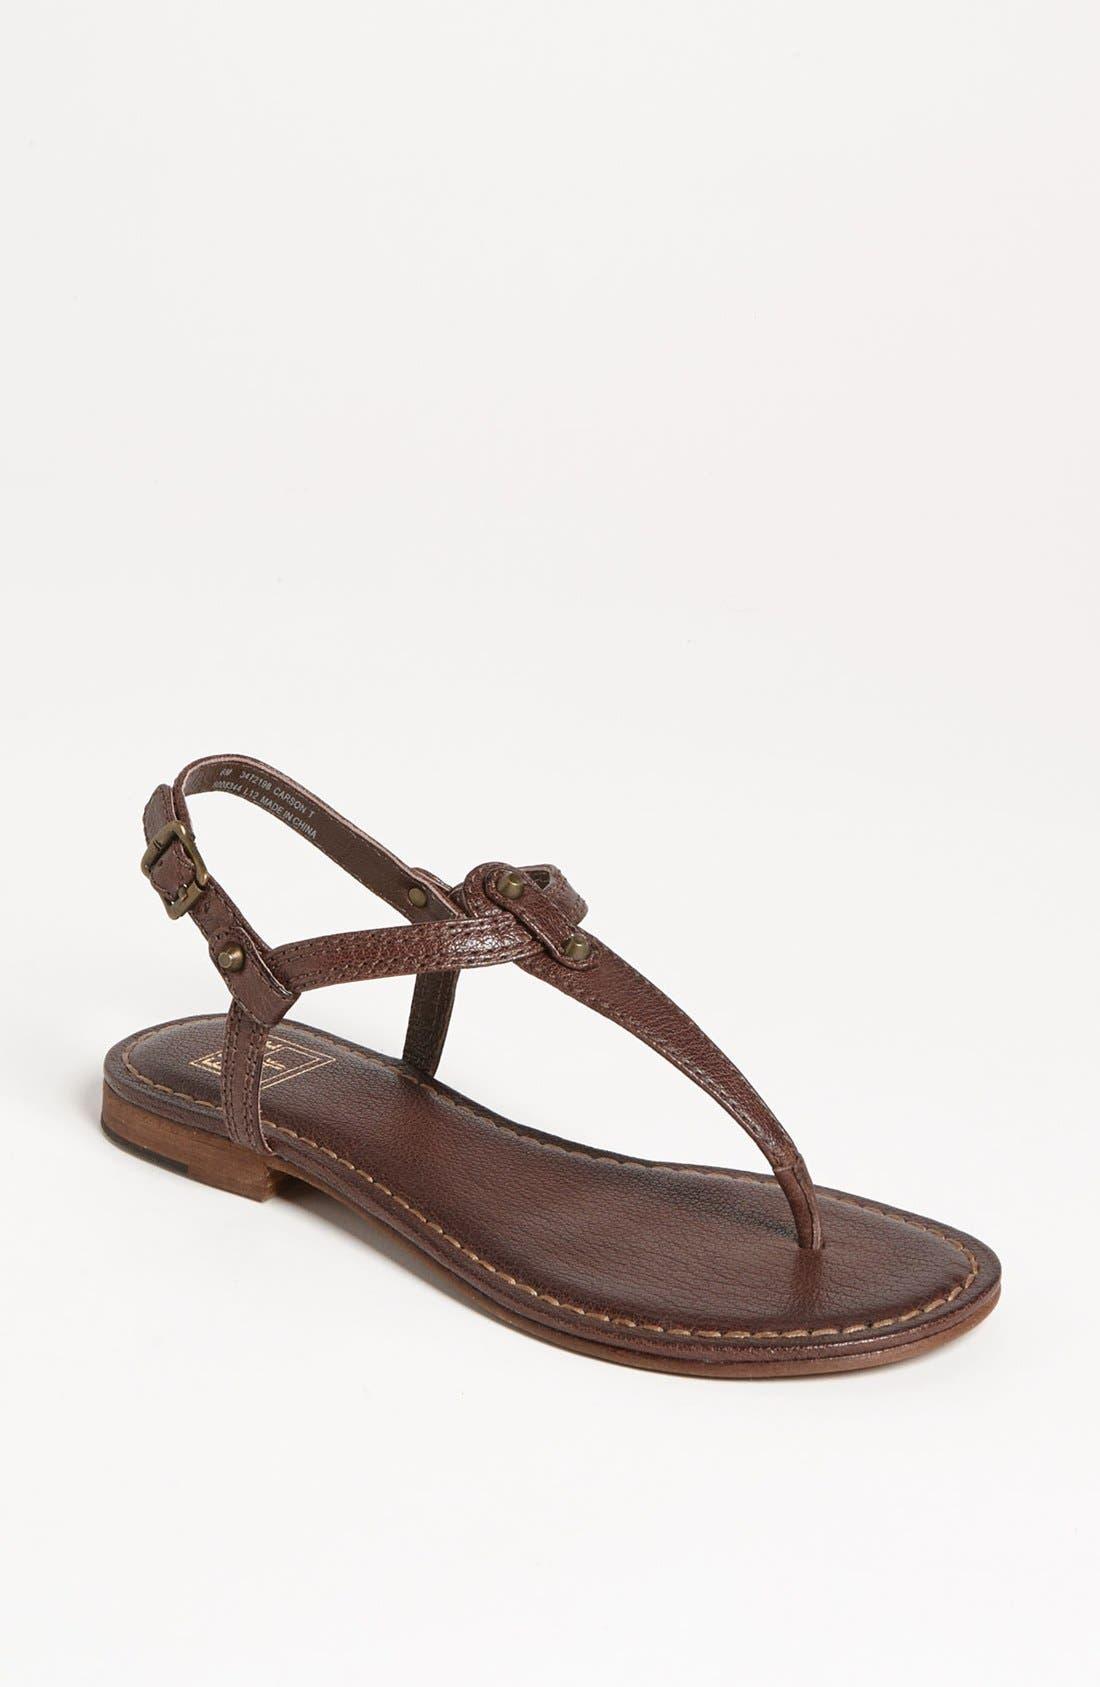 Main Image - Frye 'Carson' Sandal